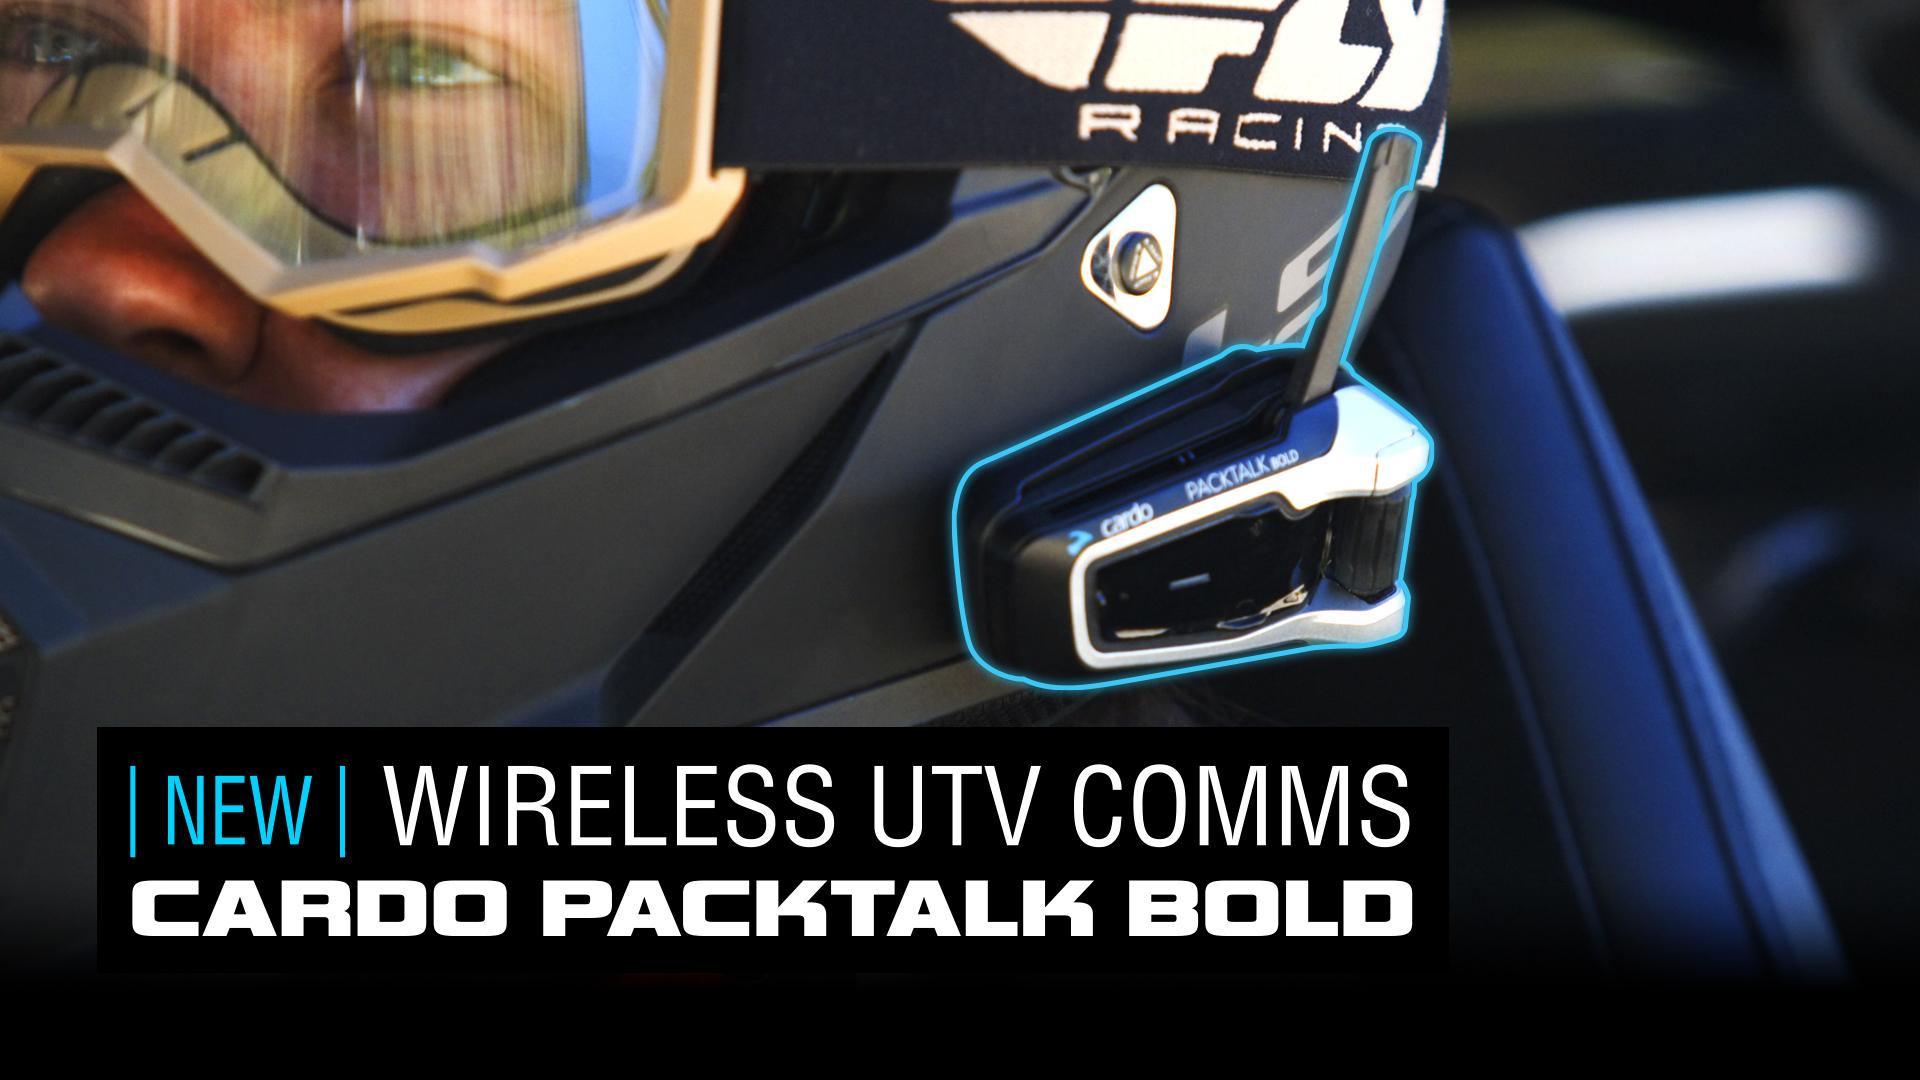 2020 UTVUG Feature Product cardo systems